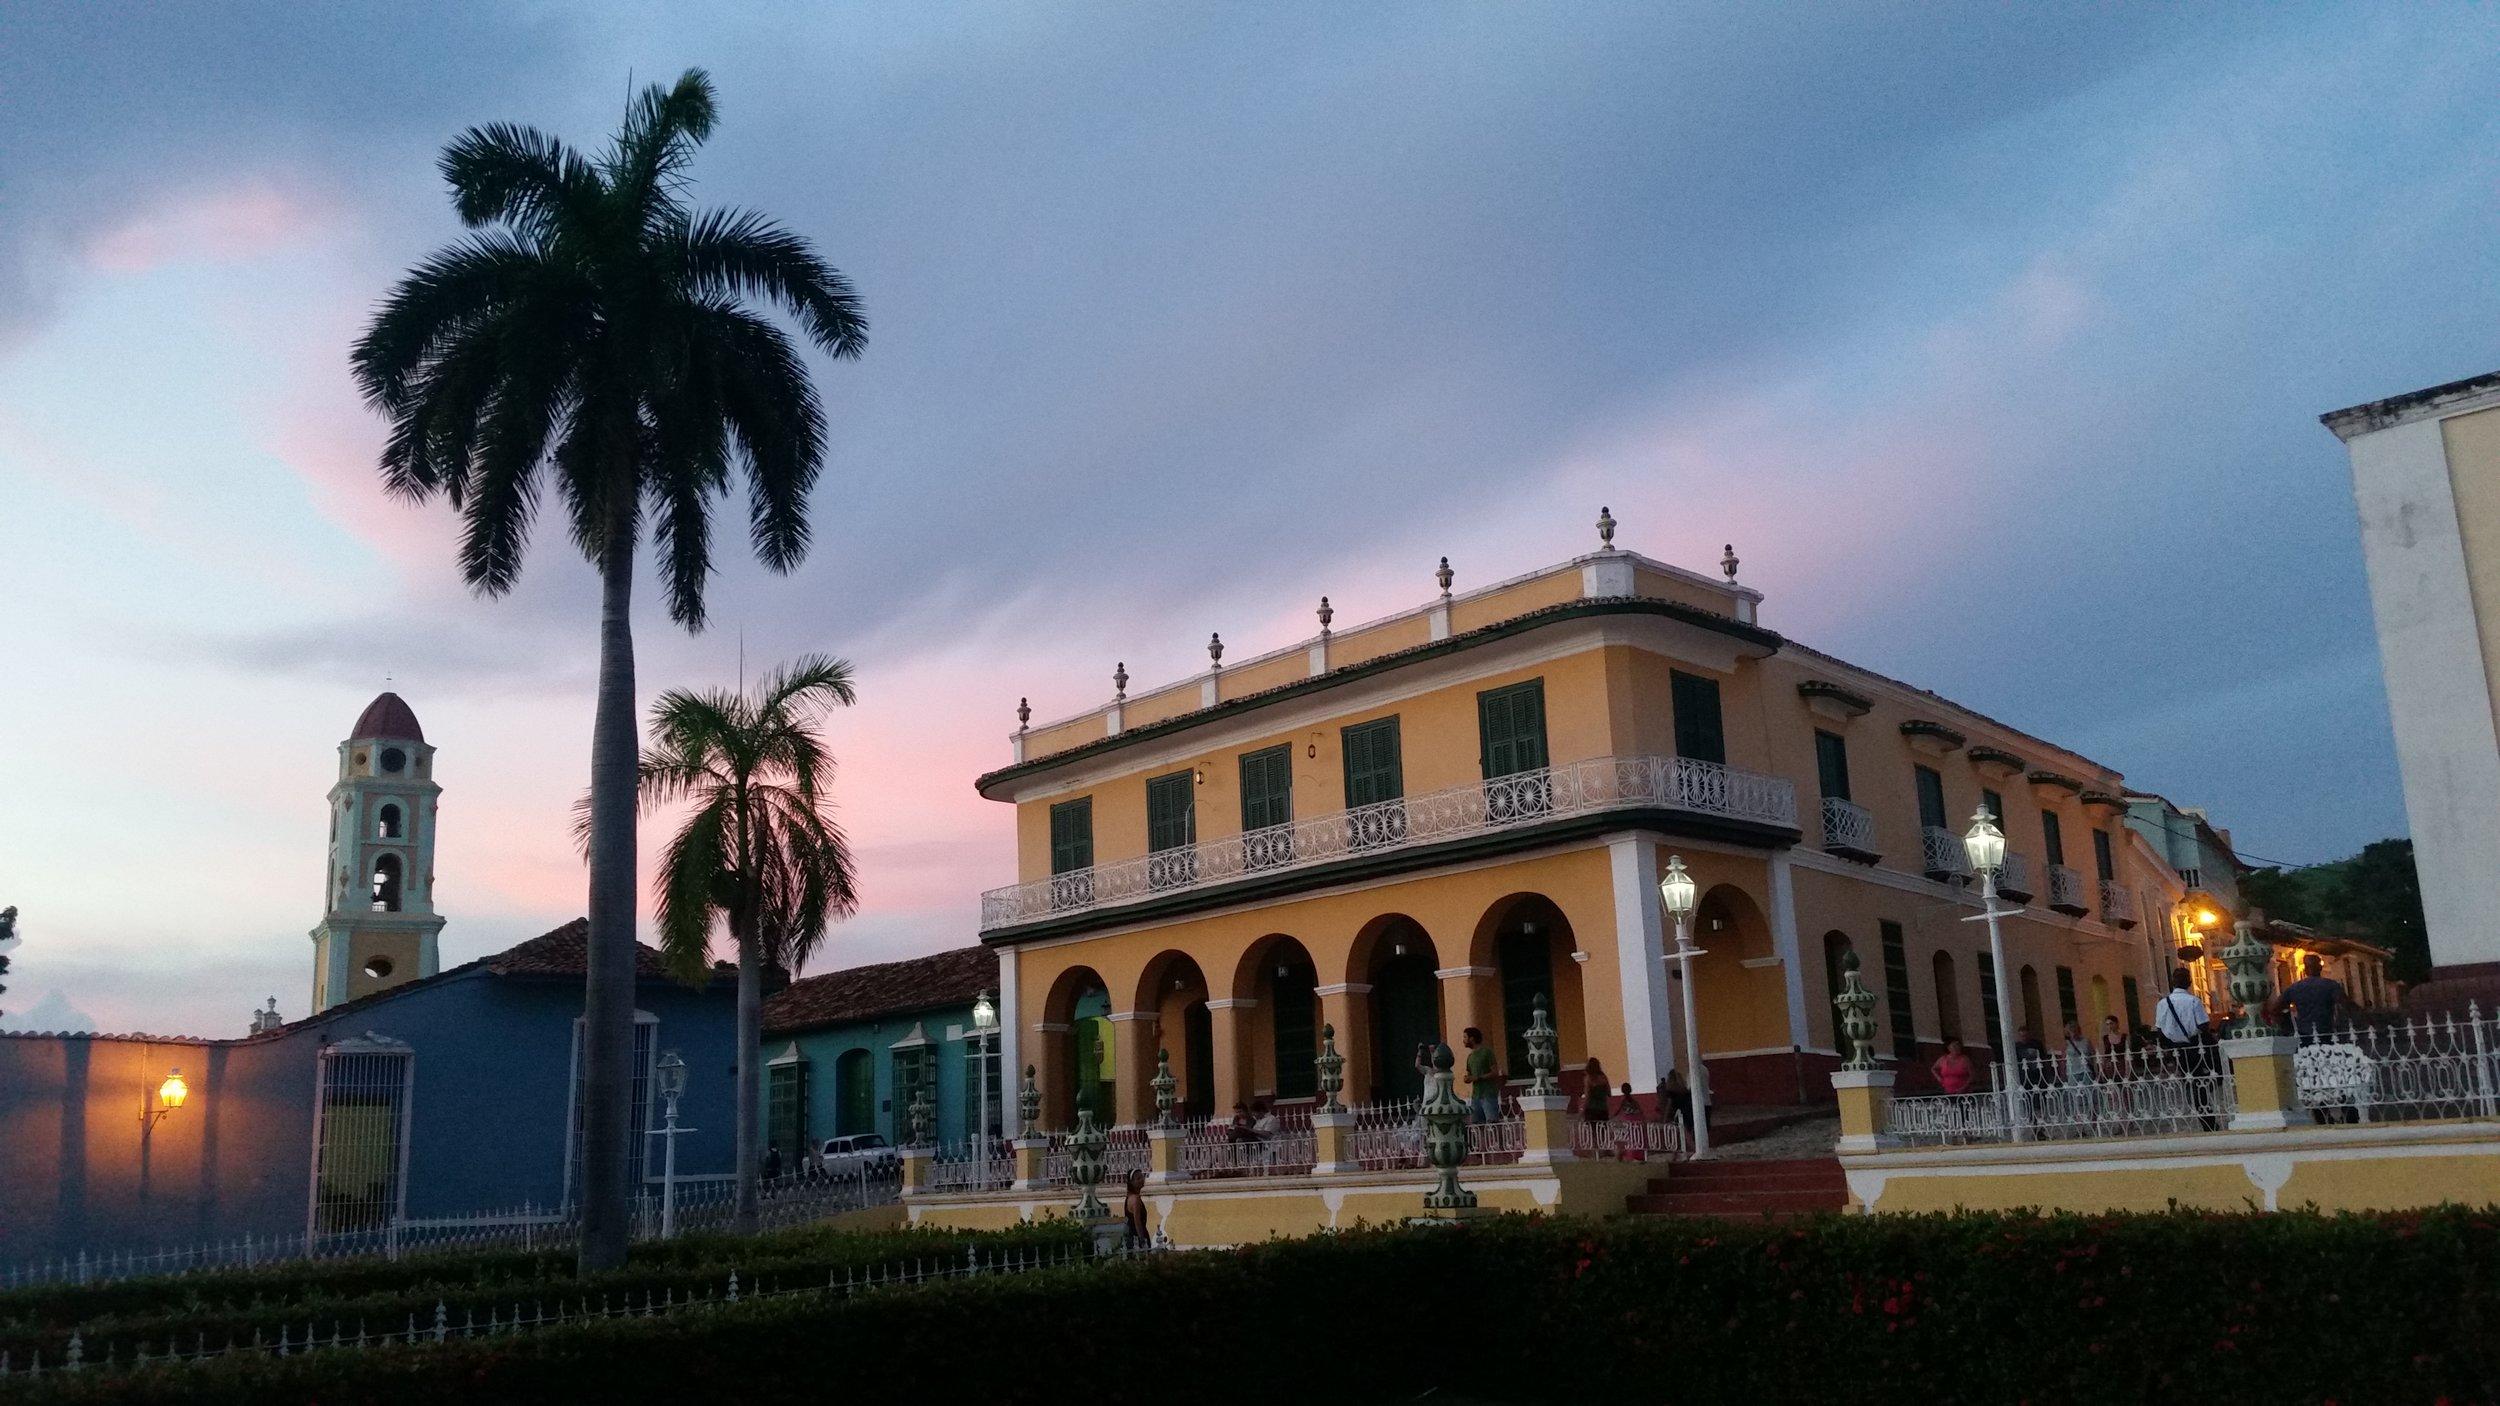 museo romantico on plaza mayor, the central plaza